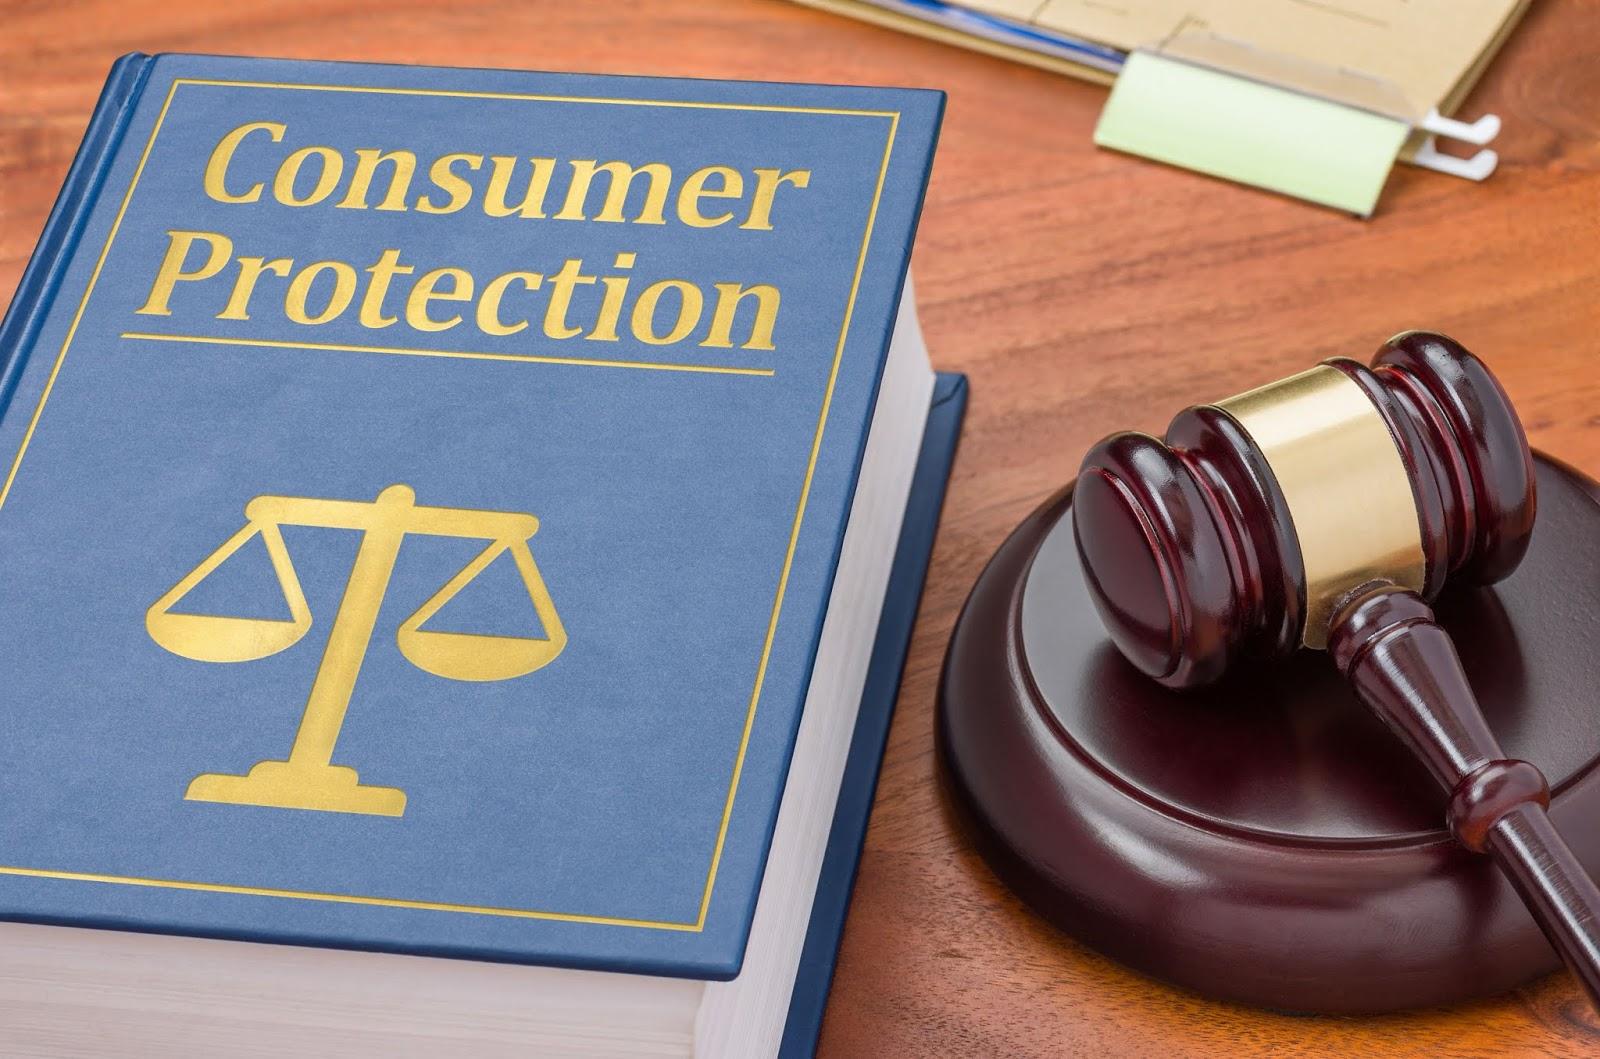 Consumer forum complaint procedure for sexual harassment